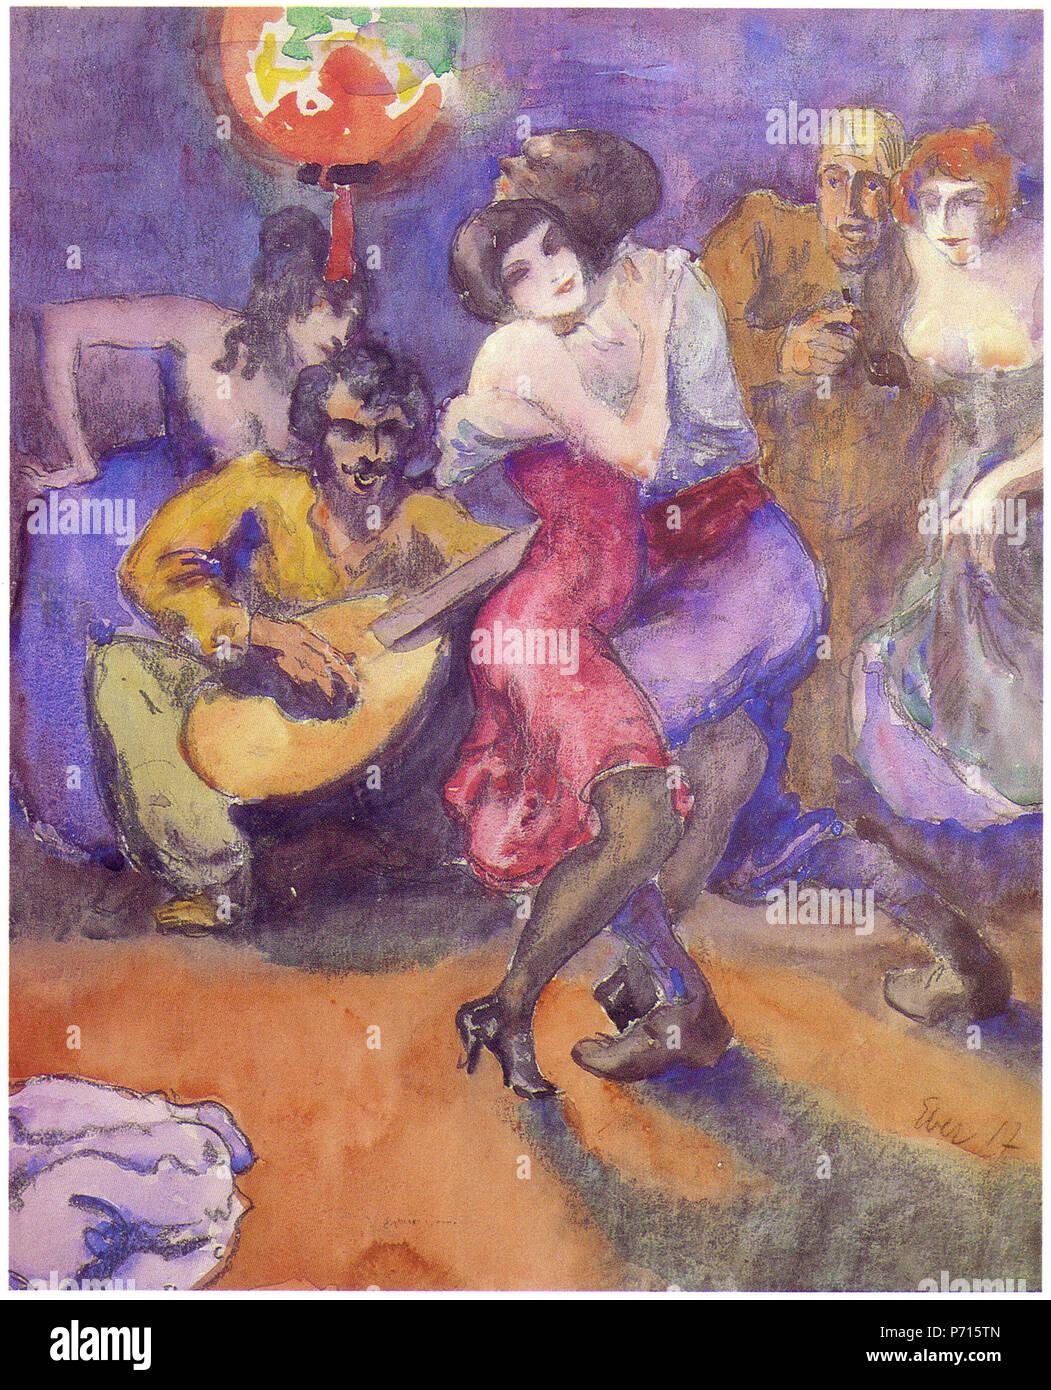 Deutsch: Elk EberTanzabend, 1917. Aquarell . 1917 9 Elk Eber - Tanzabend, 1917 - Stock Image